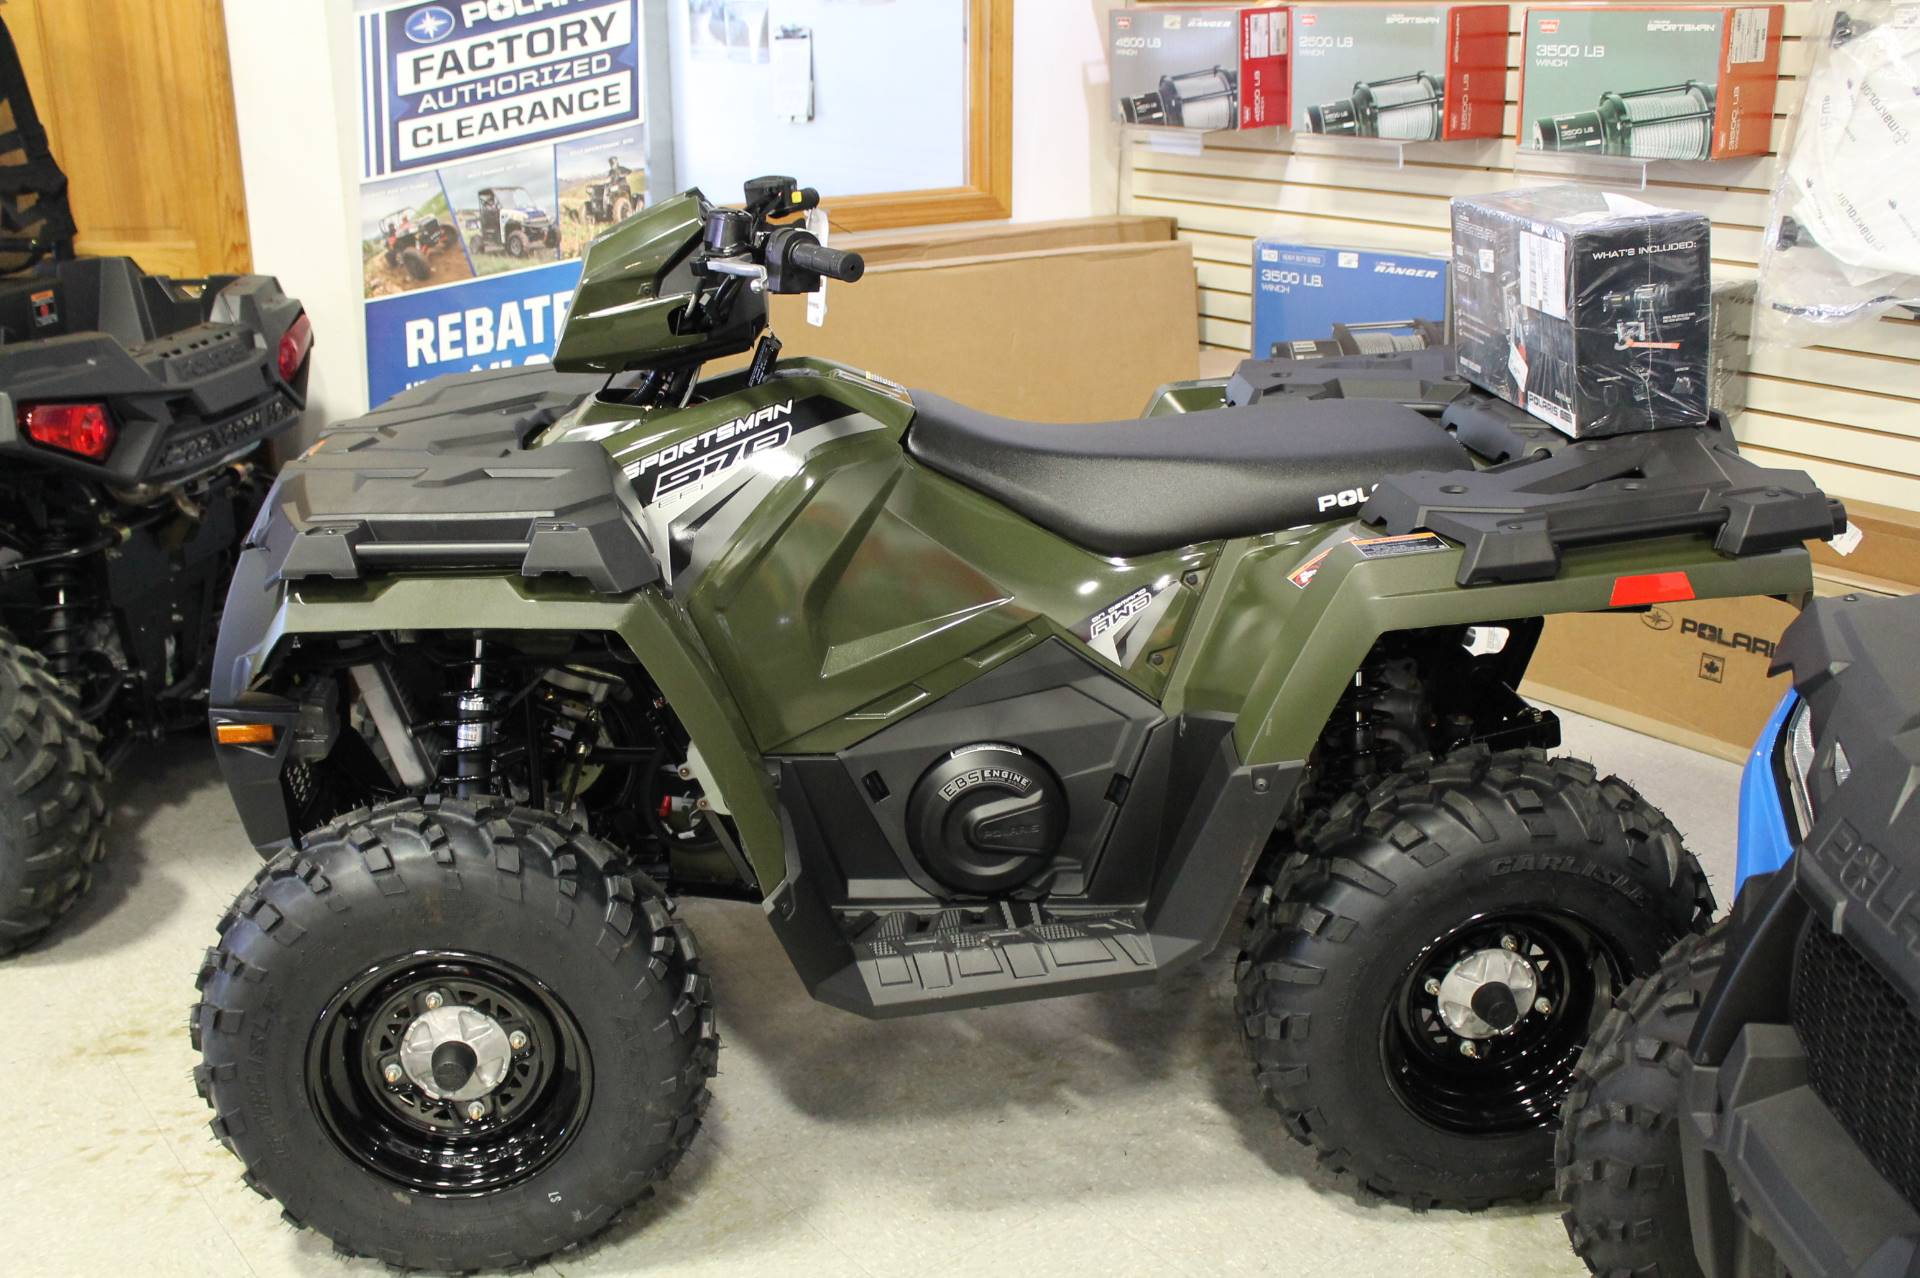 New 2018 Polaris Sportsman 570 EPS ATVs in Adams, MA | Stock Number ...